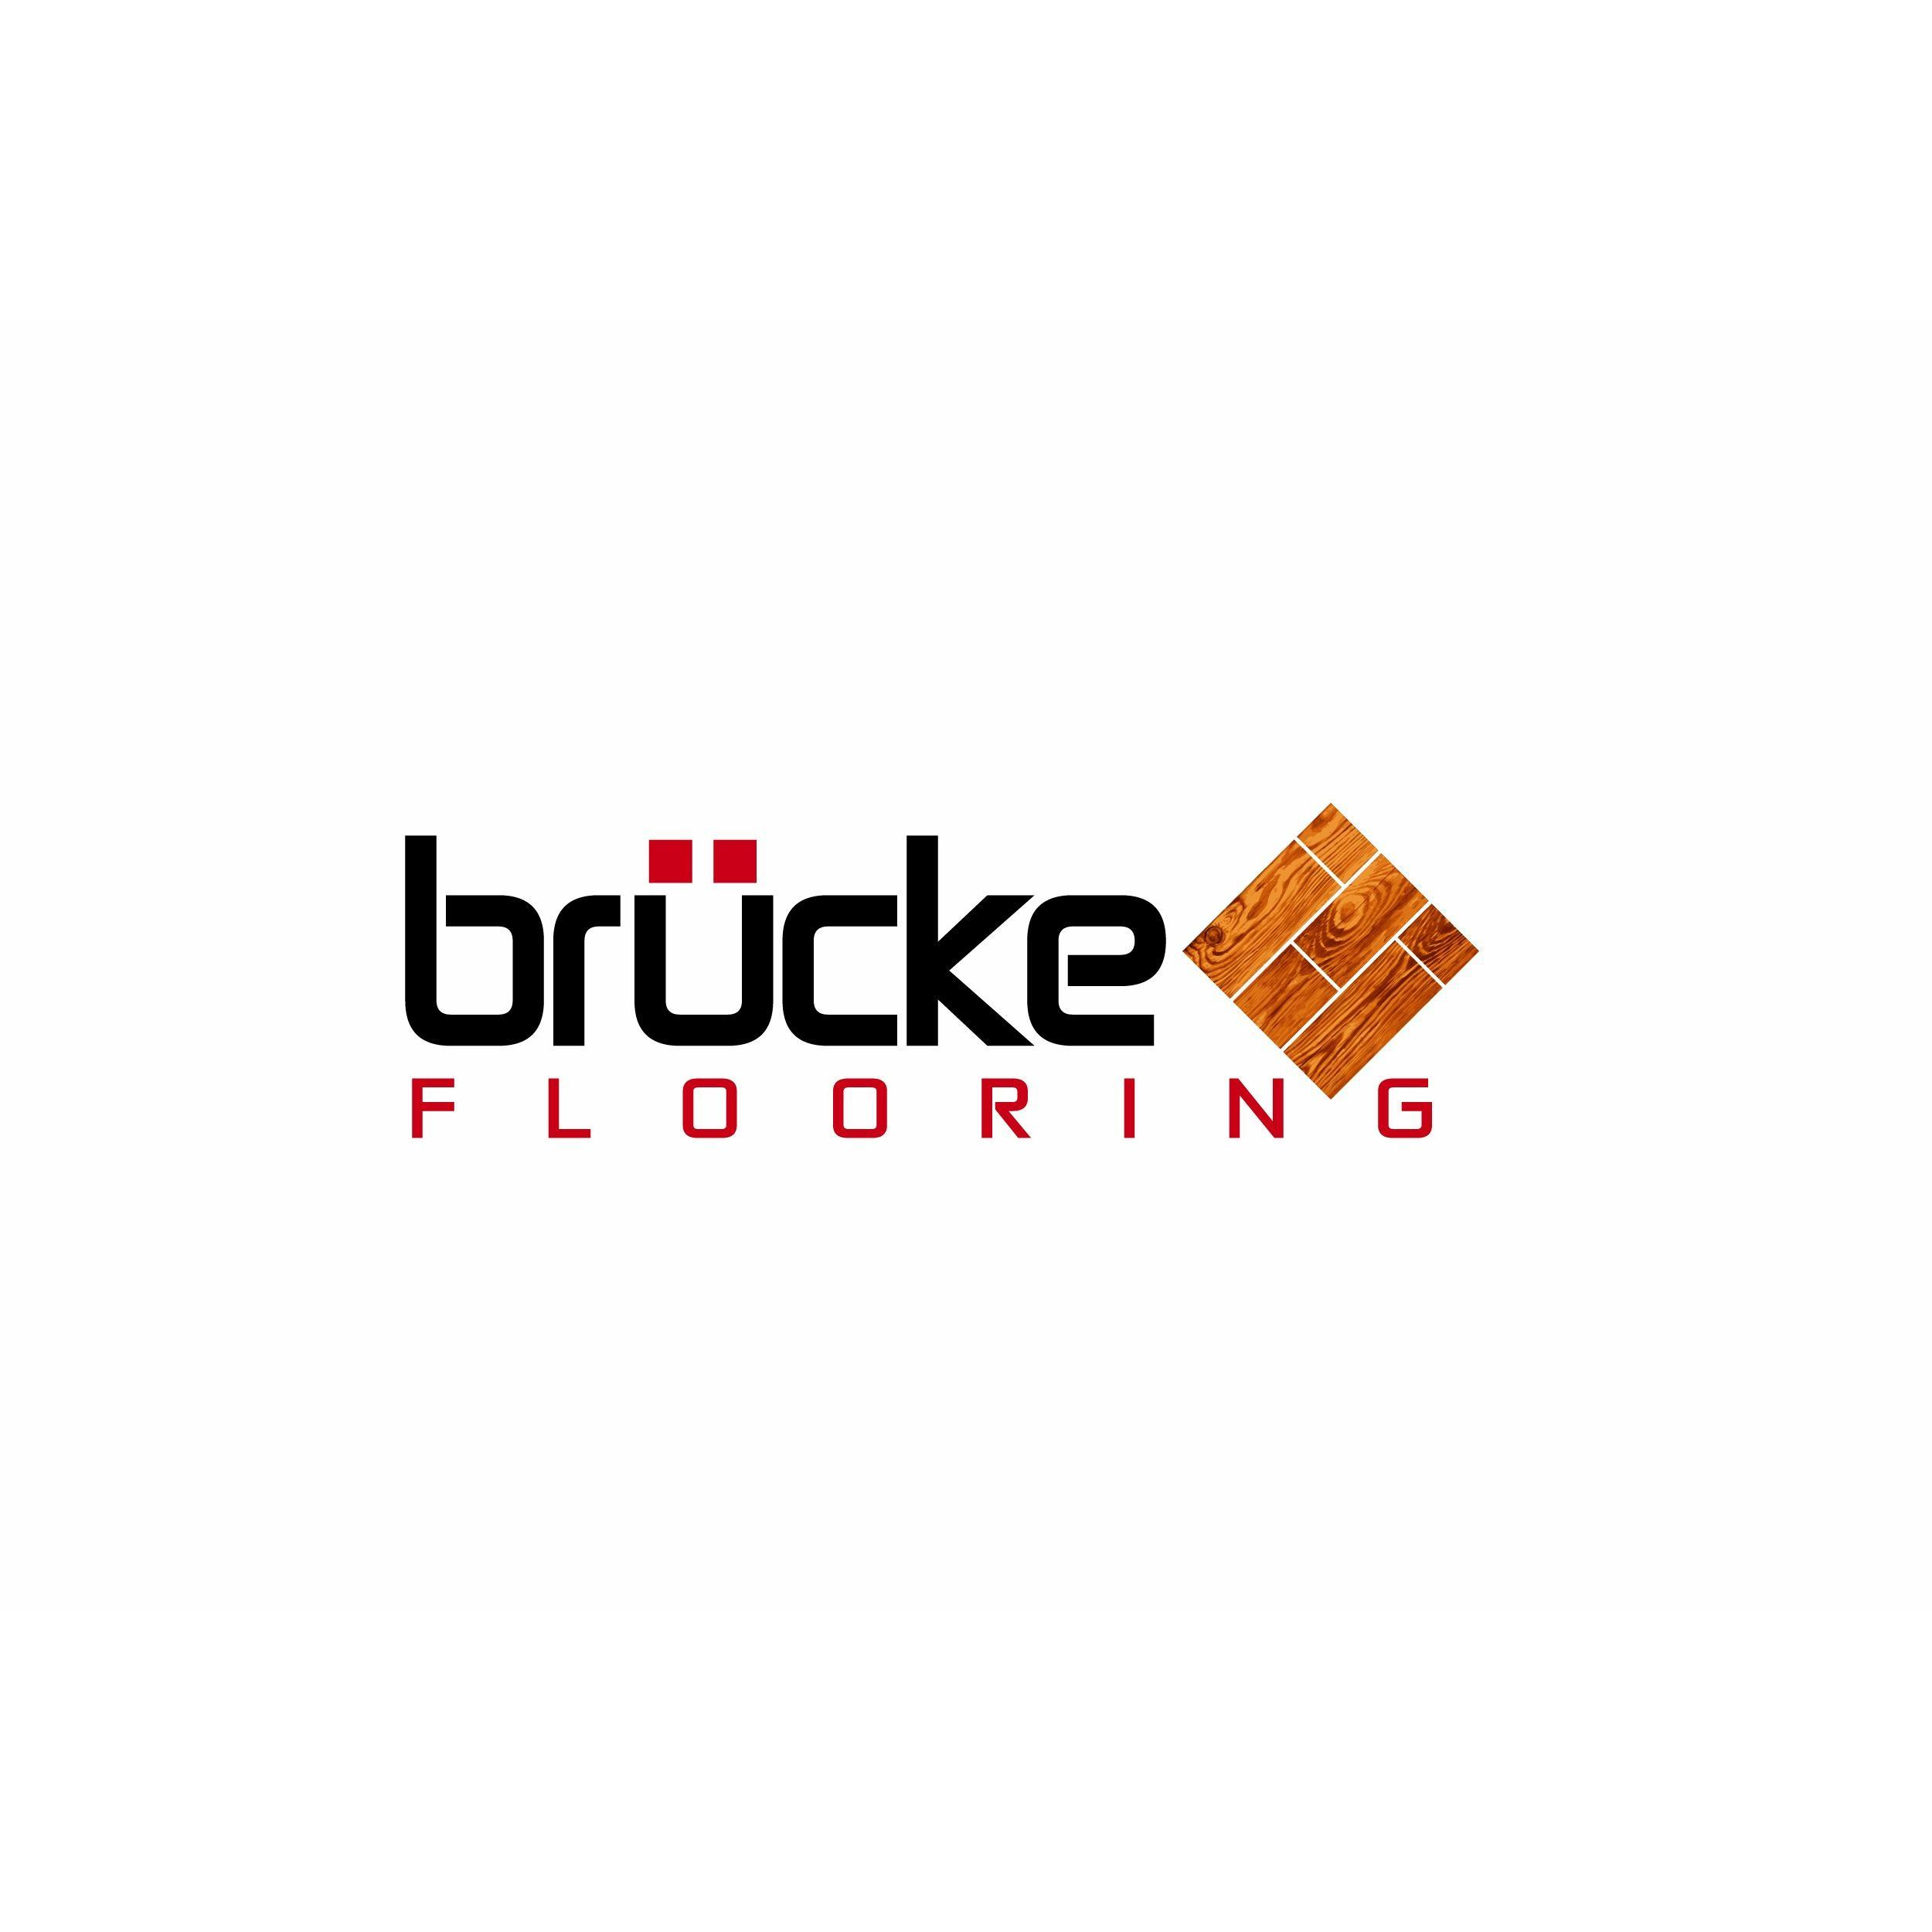 Brucke Flooring Co. image 1